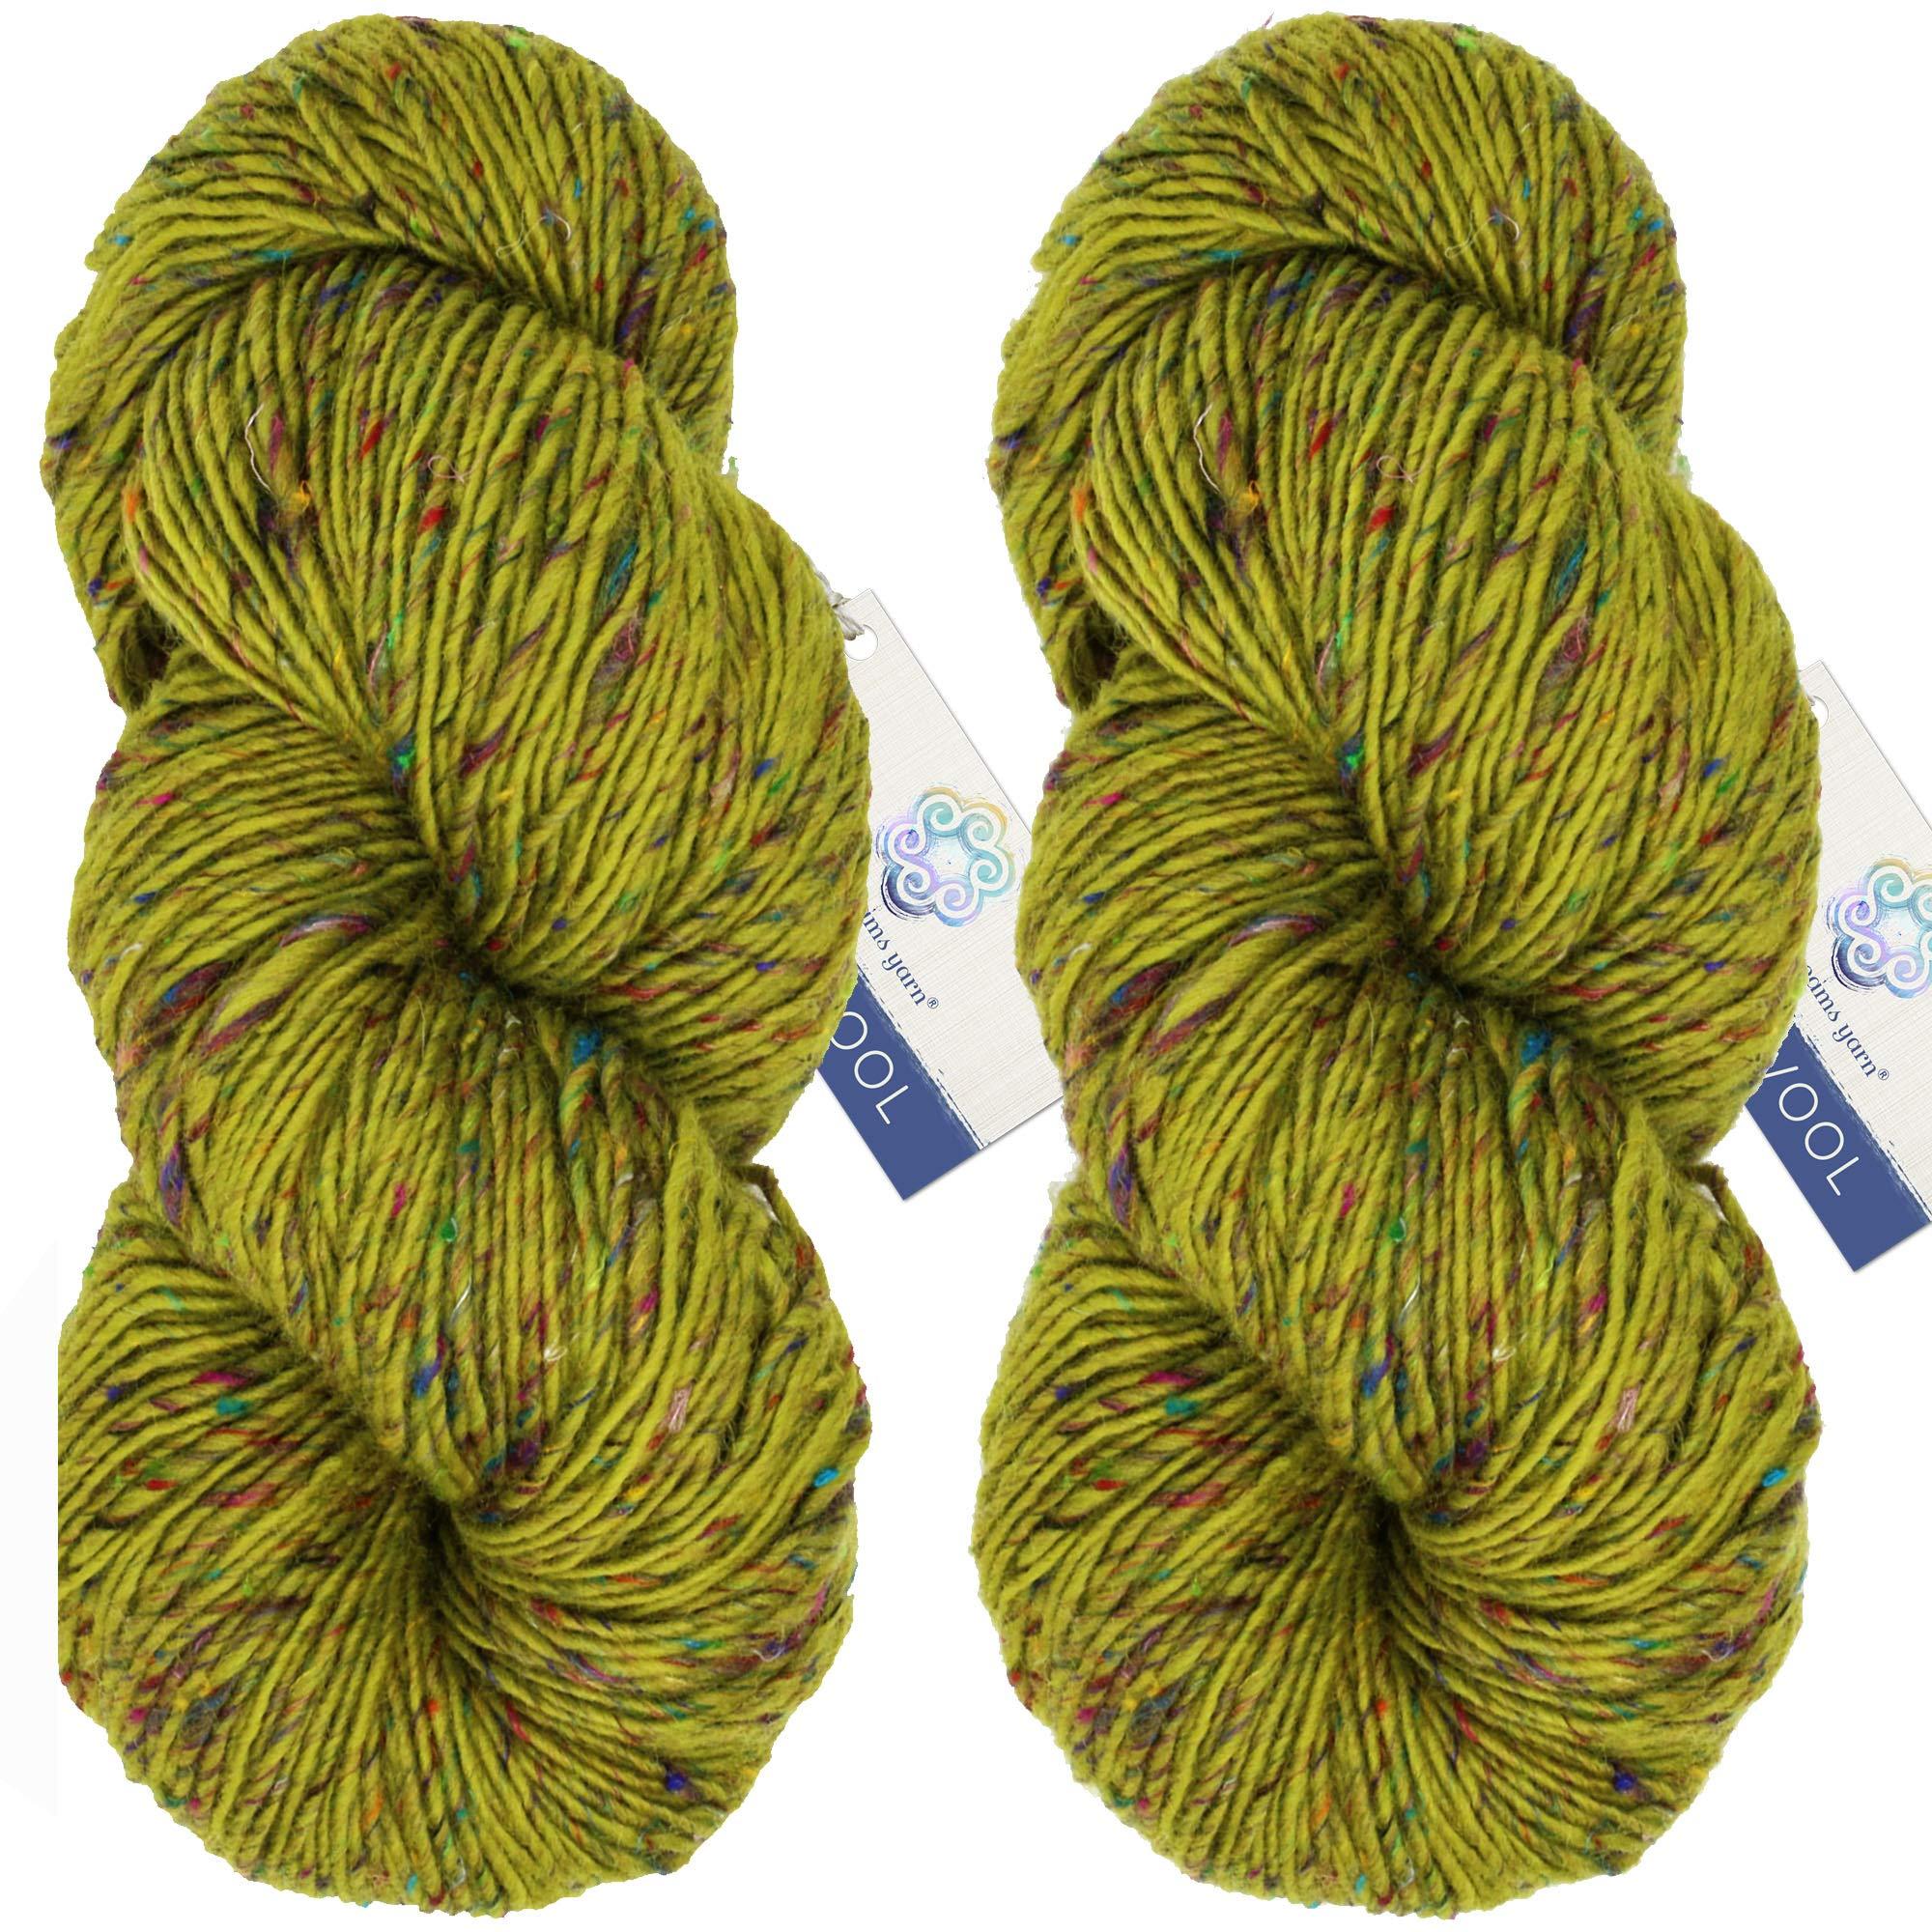 Living Dreams Yarn BOLLYWOOL DK. Super Soft Merino and Sari Silk. Colorful Tweed Yarn with Boho Flair. Homespun in USA. Two Pack, Dakini